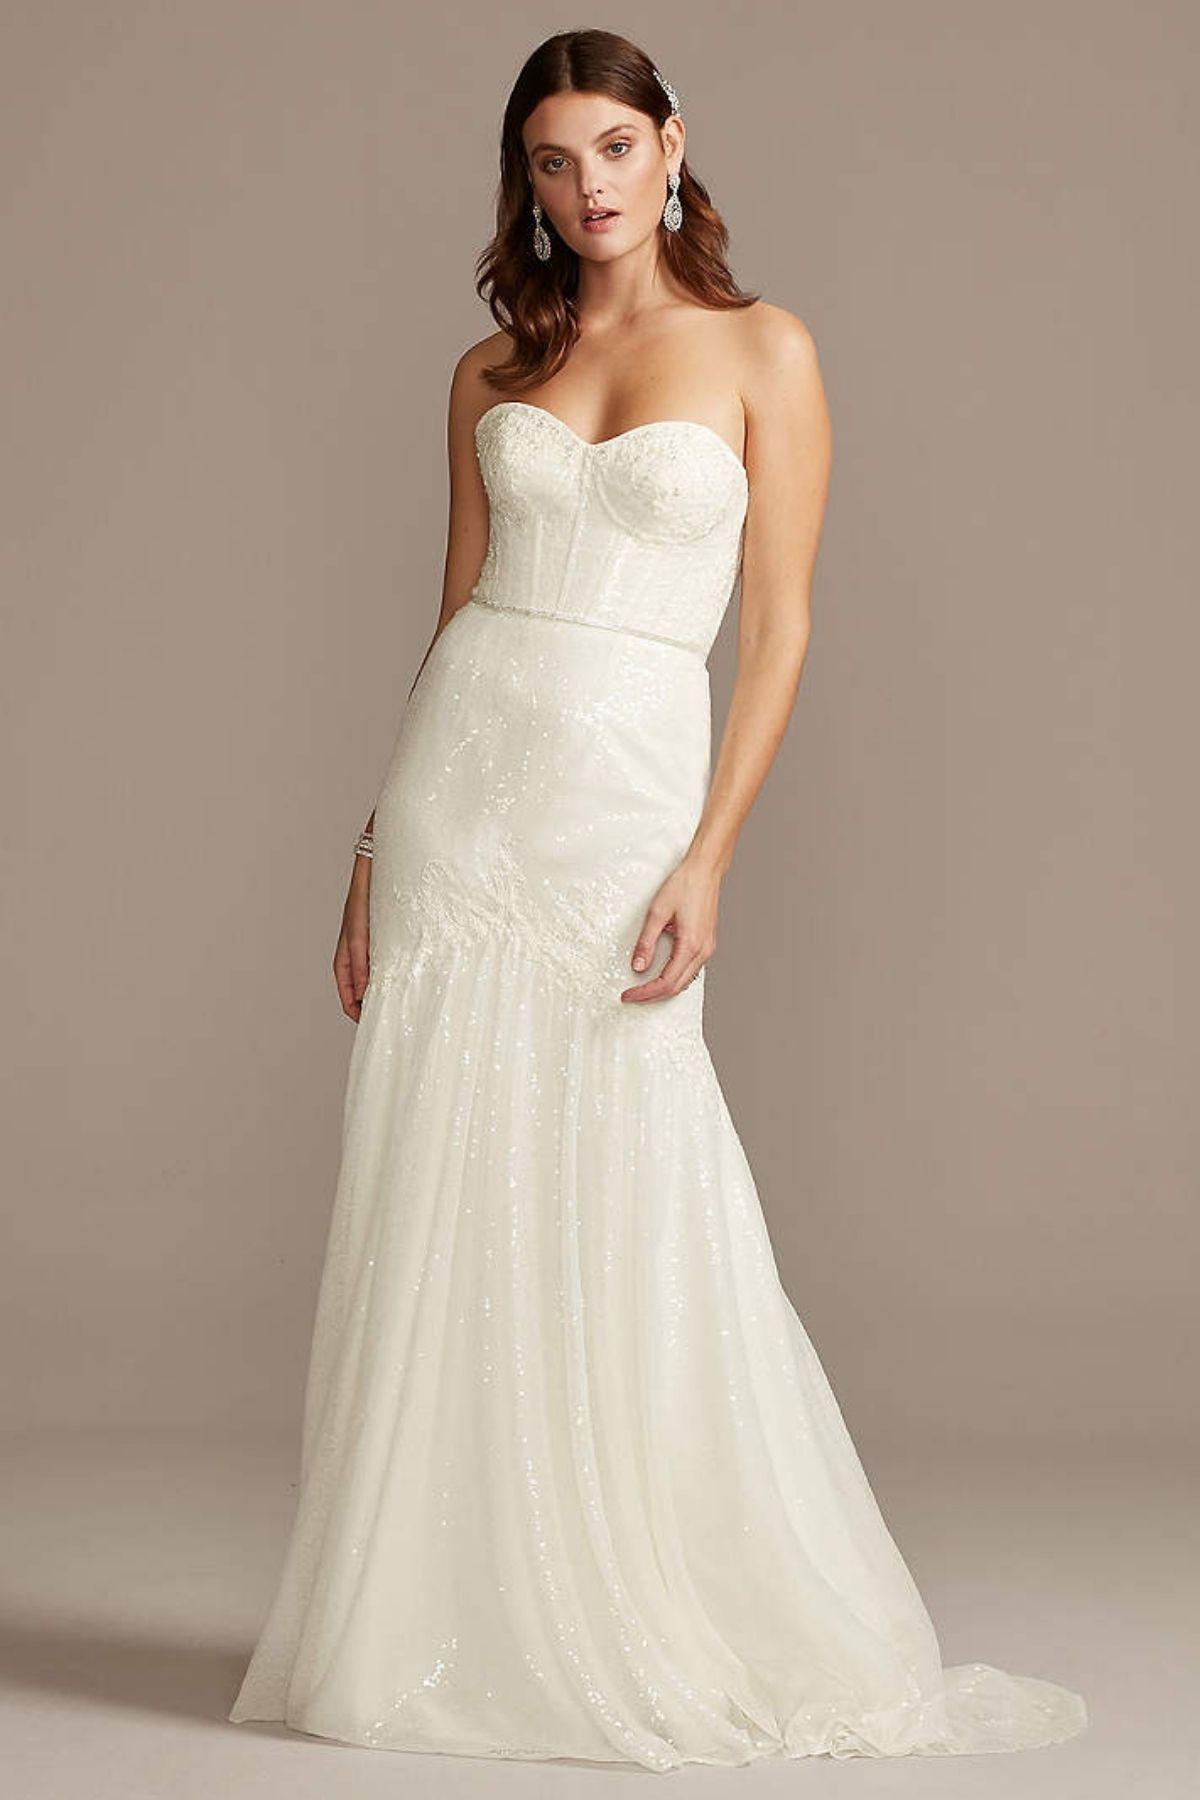 7. Allover Sequin Corset Petite Wedding Dress